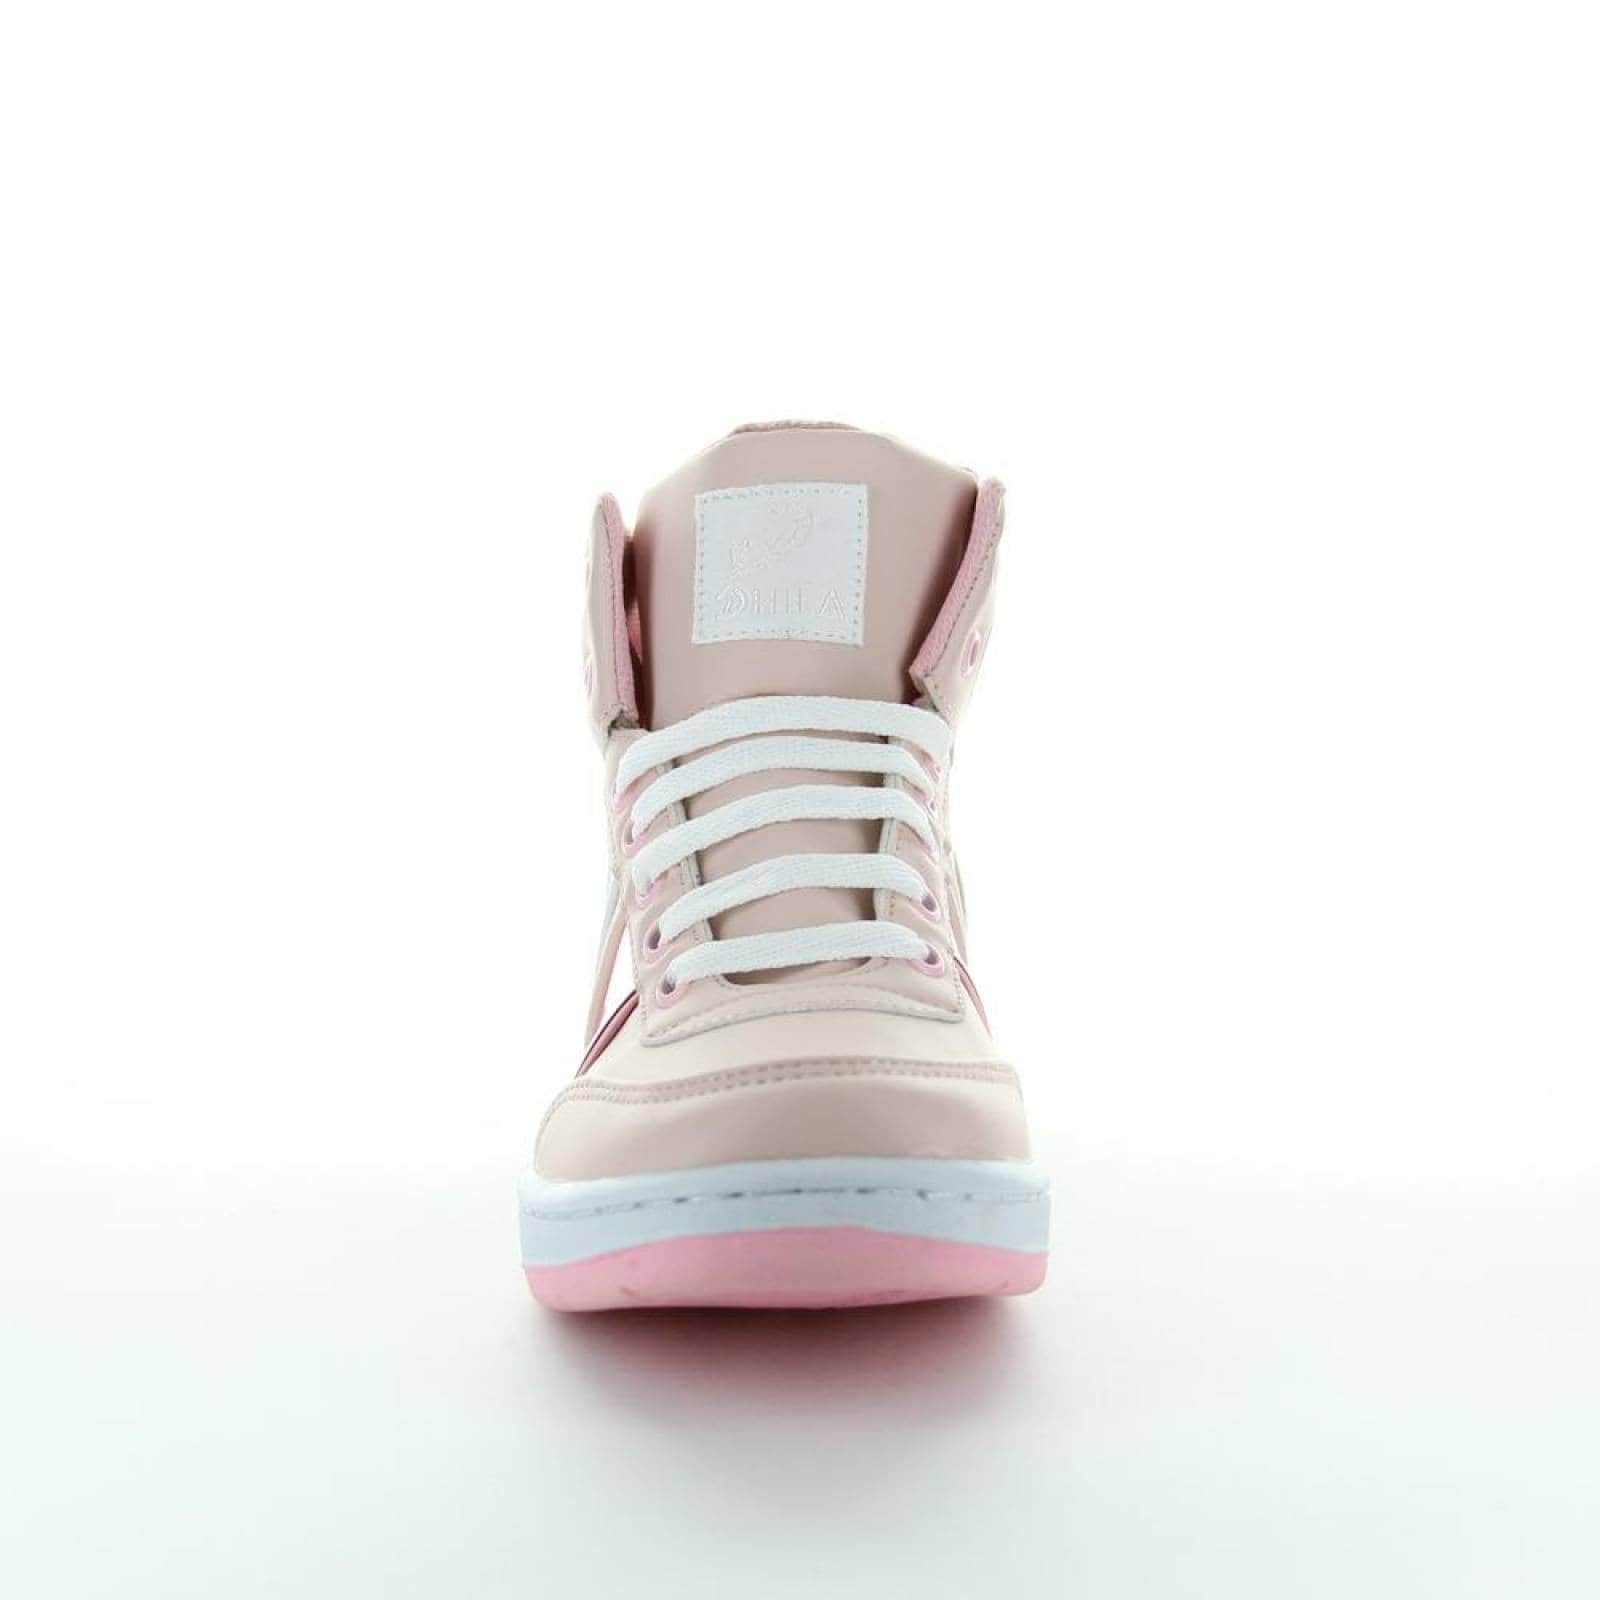 Tenis Dhila Mujer Rosa Tipo Napa 528